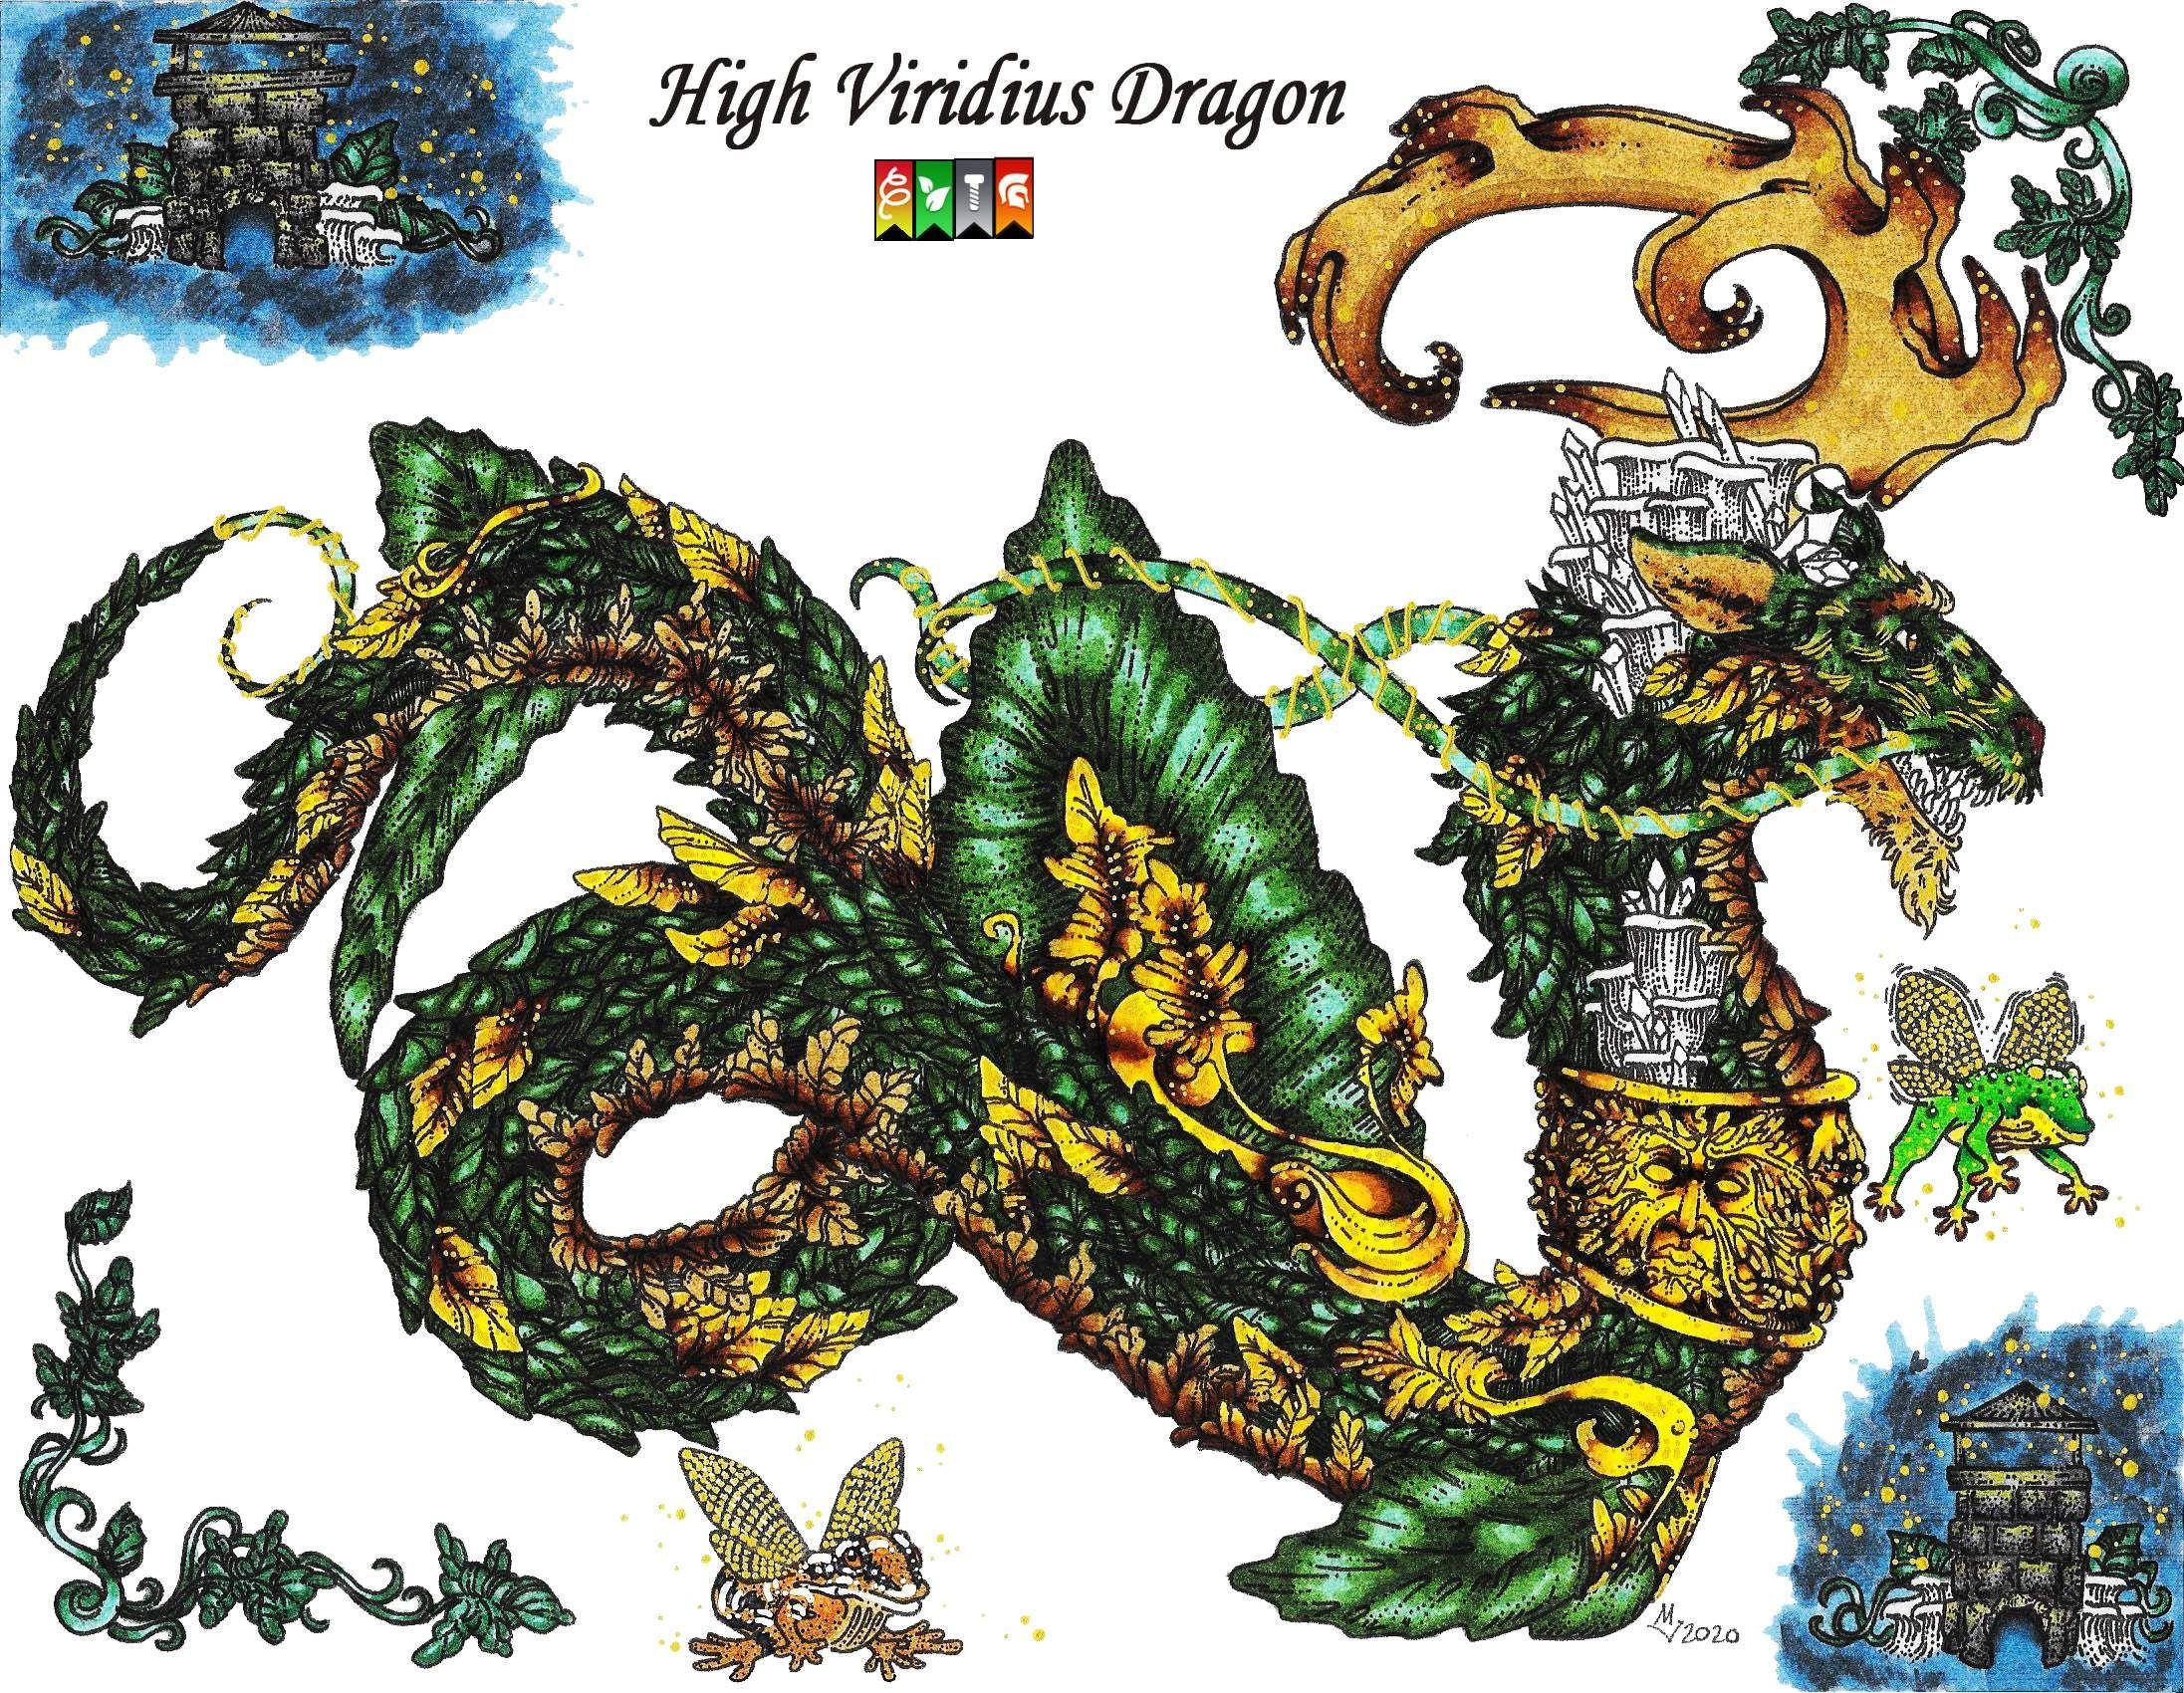 0_1614712960080_High Viridius Dragon, Anthony Valencia.jpg